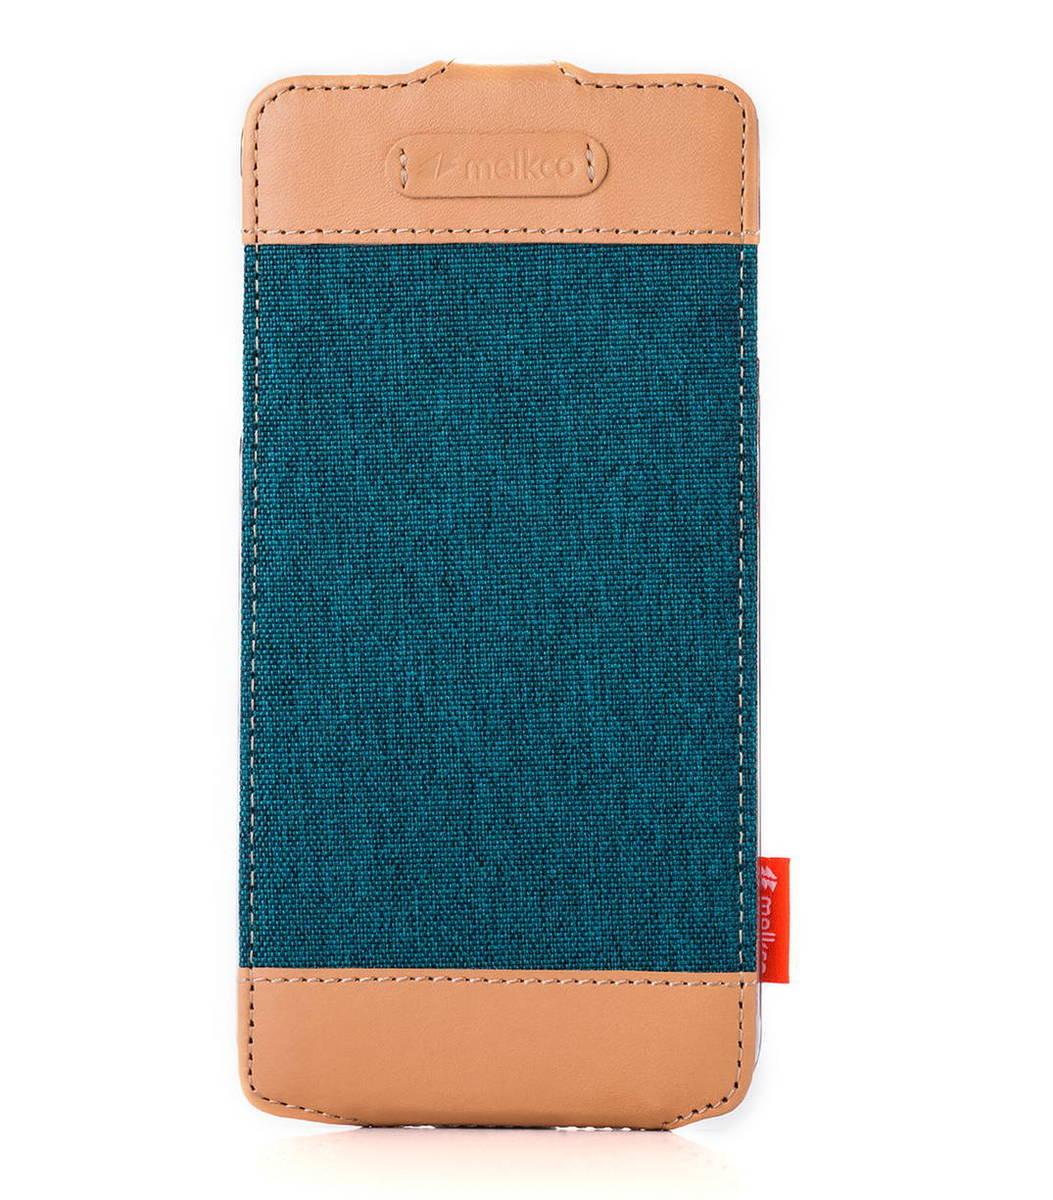 "Apple Iphone 6 Plus/6s Plus (5.5"") Jacka Type Cru系列高級時尚真皮手機套(藍色)"